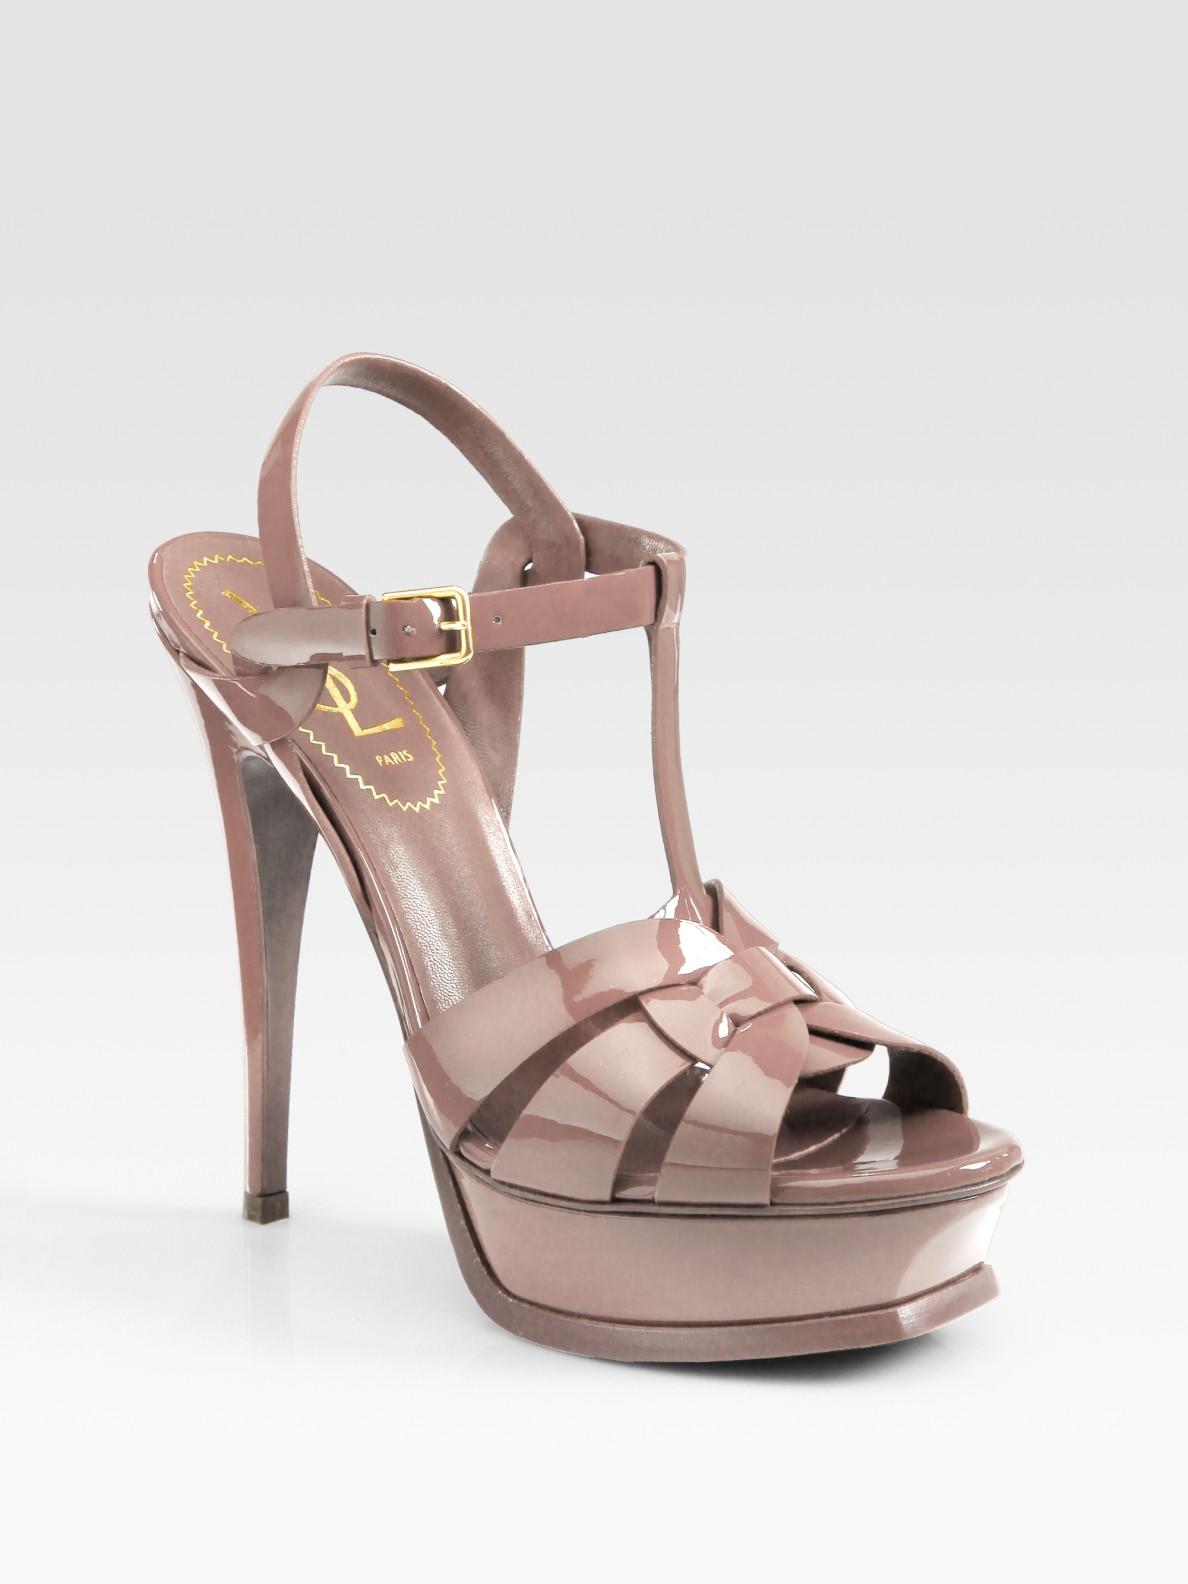 d5b6856296ebb Lyst - Saint Laurent Ysl Tribute Patent Leather Platform Sandals in Pink